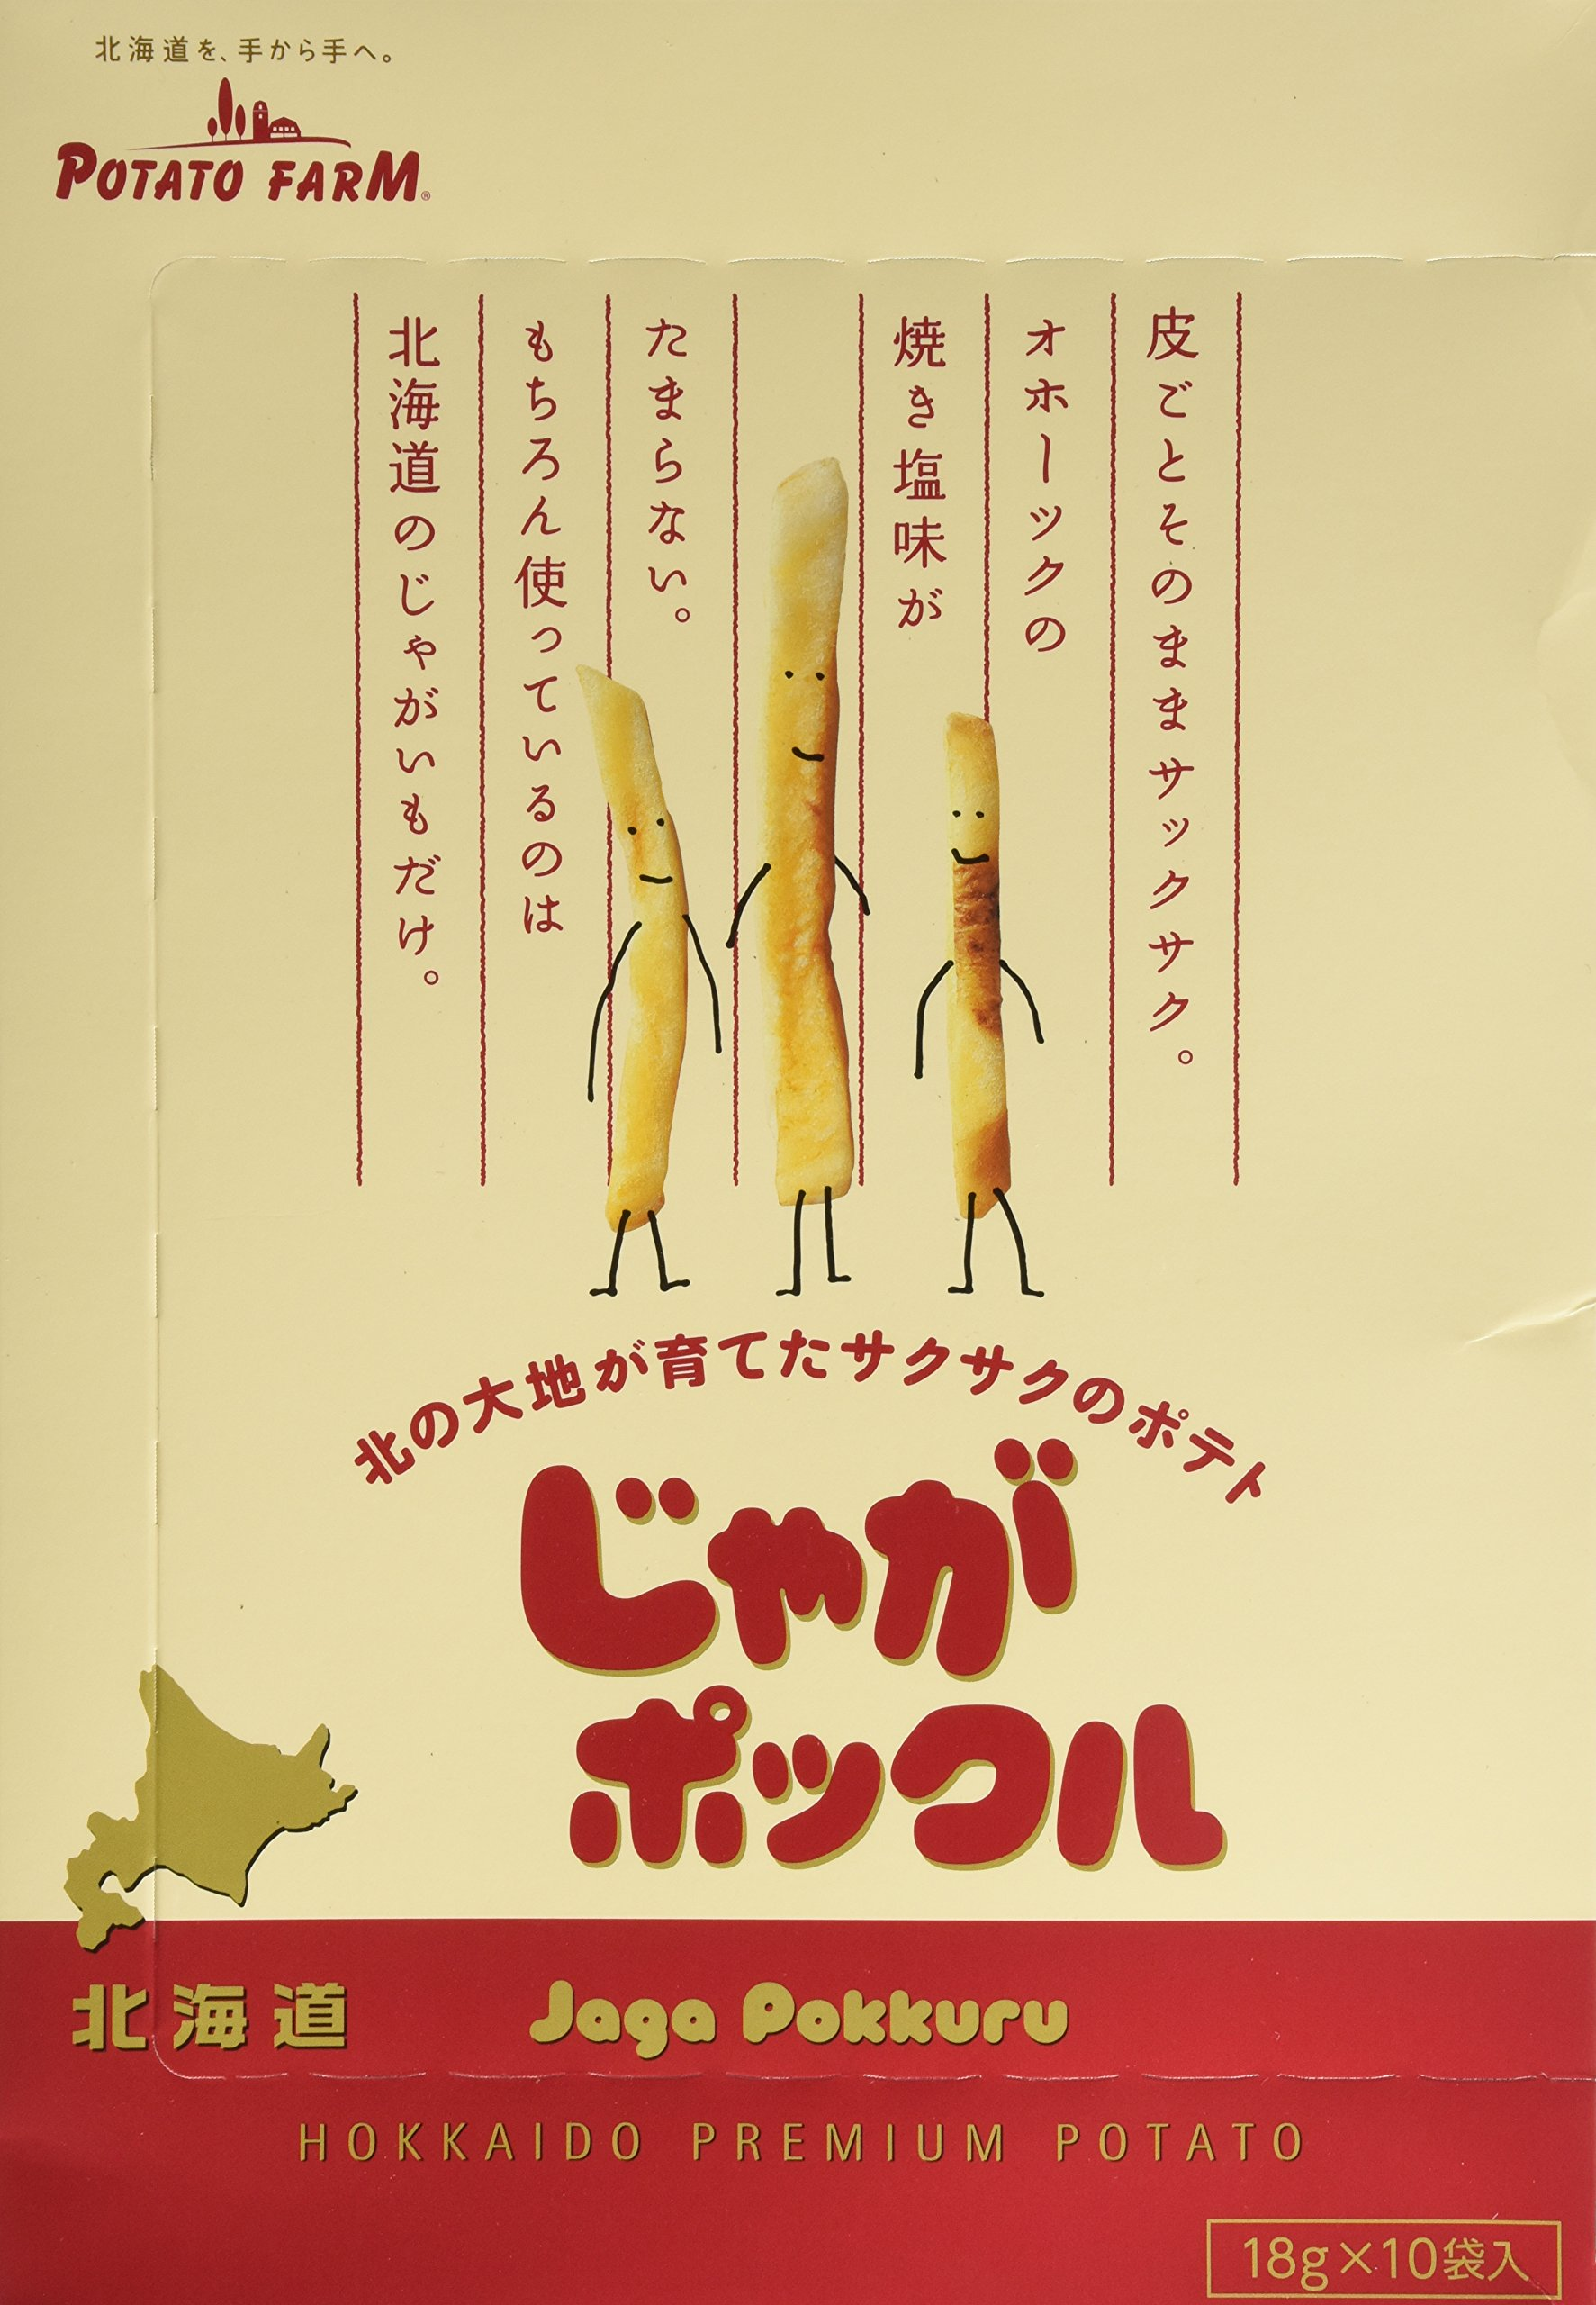 Calbee Japan jaga-pockle potato snacks Hokkaido (18g x 10 packs) by Calbee